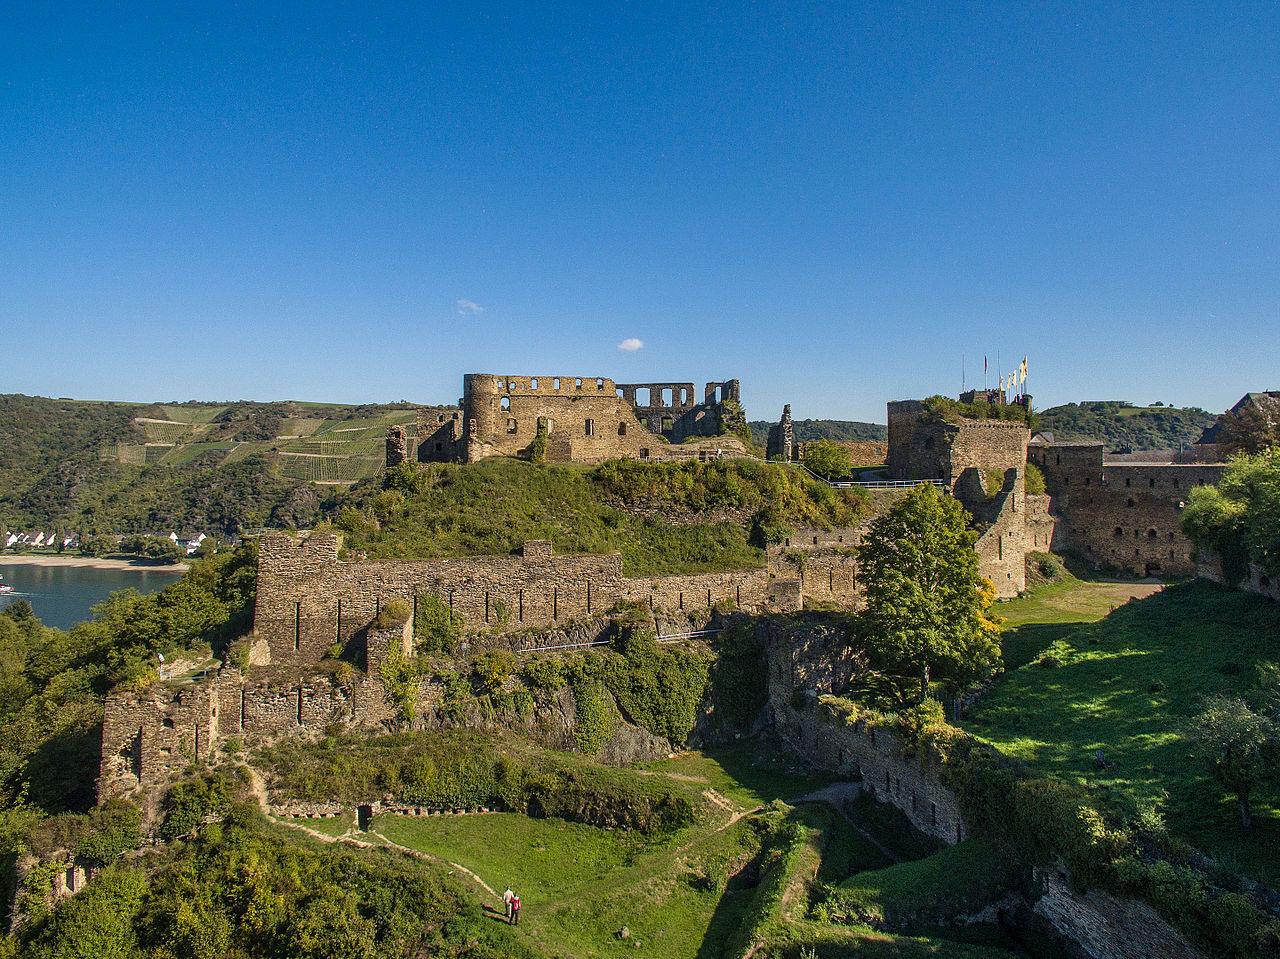 Bild Burg Rheinfels St. Goar